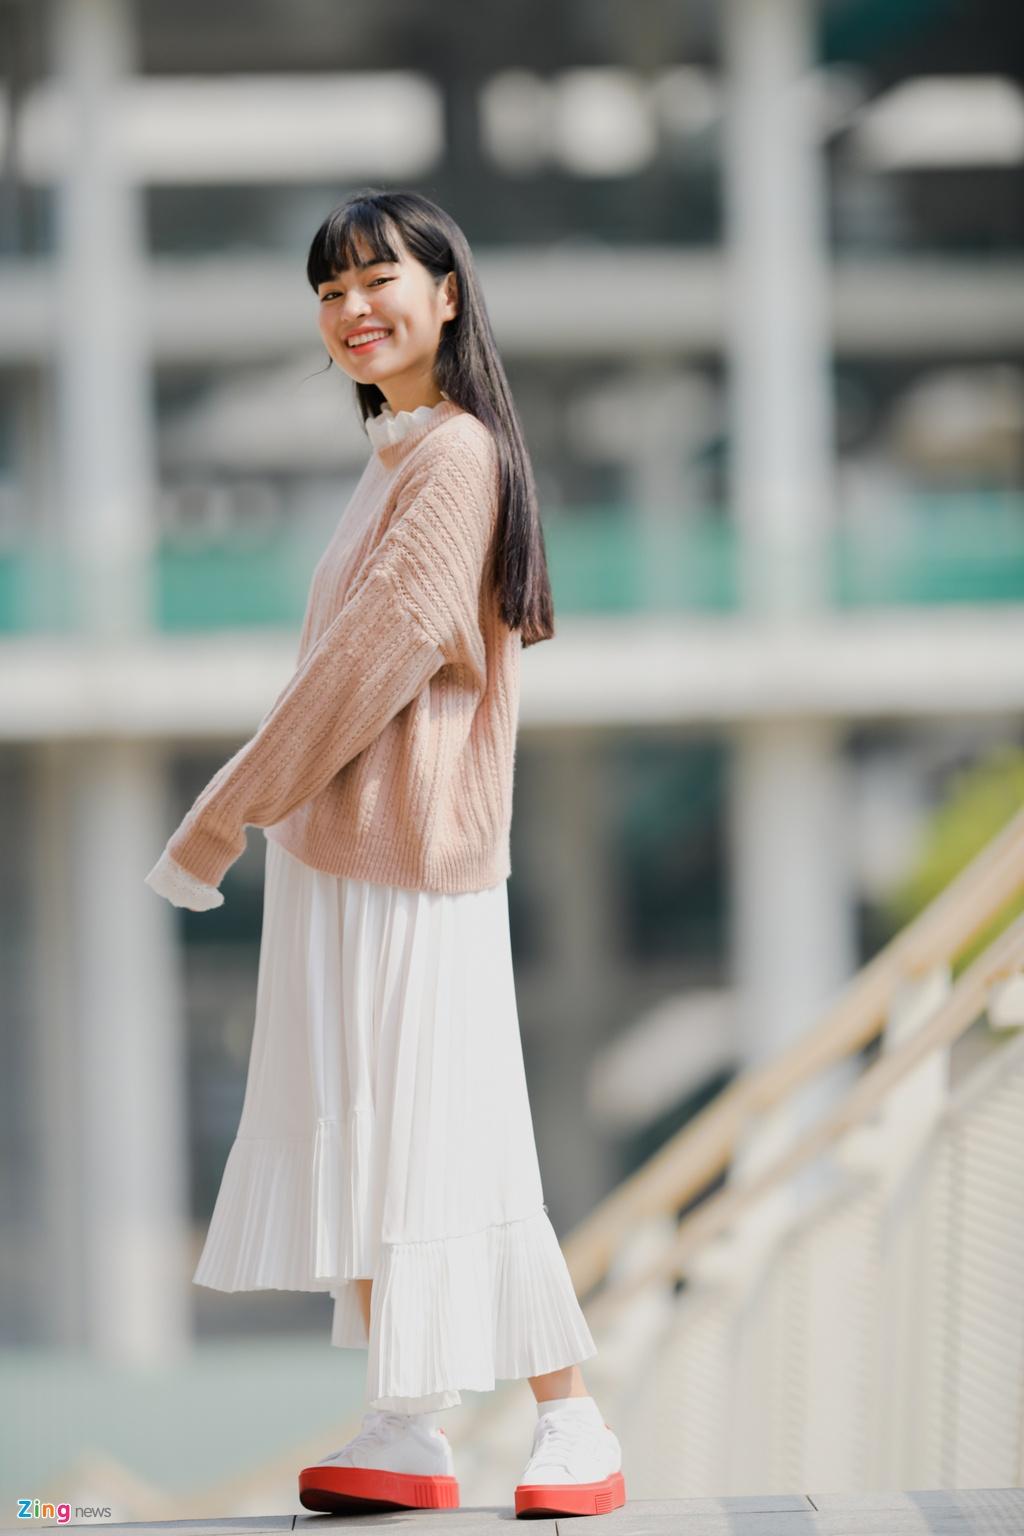 Nhan sac doi thuong cua Tra Long va Hong IELTS 8.5 hinh anh 8 matbiec7_zing.jpg